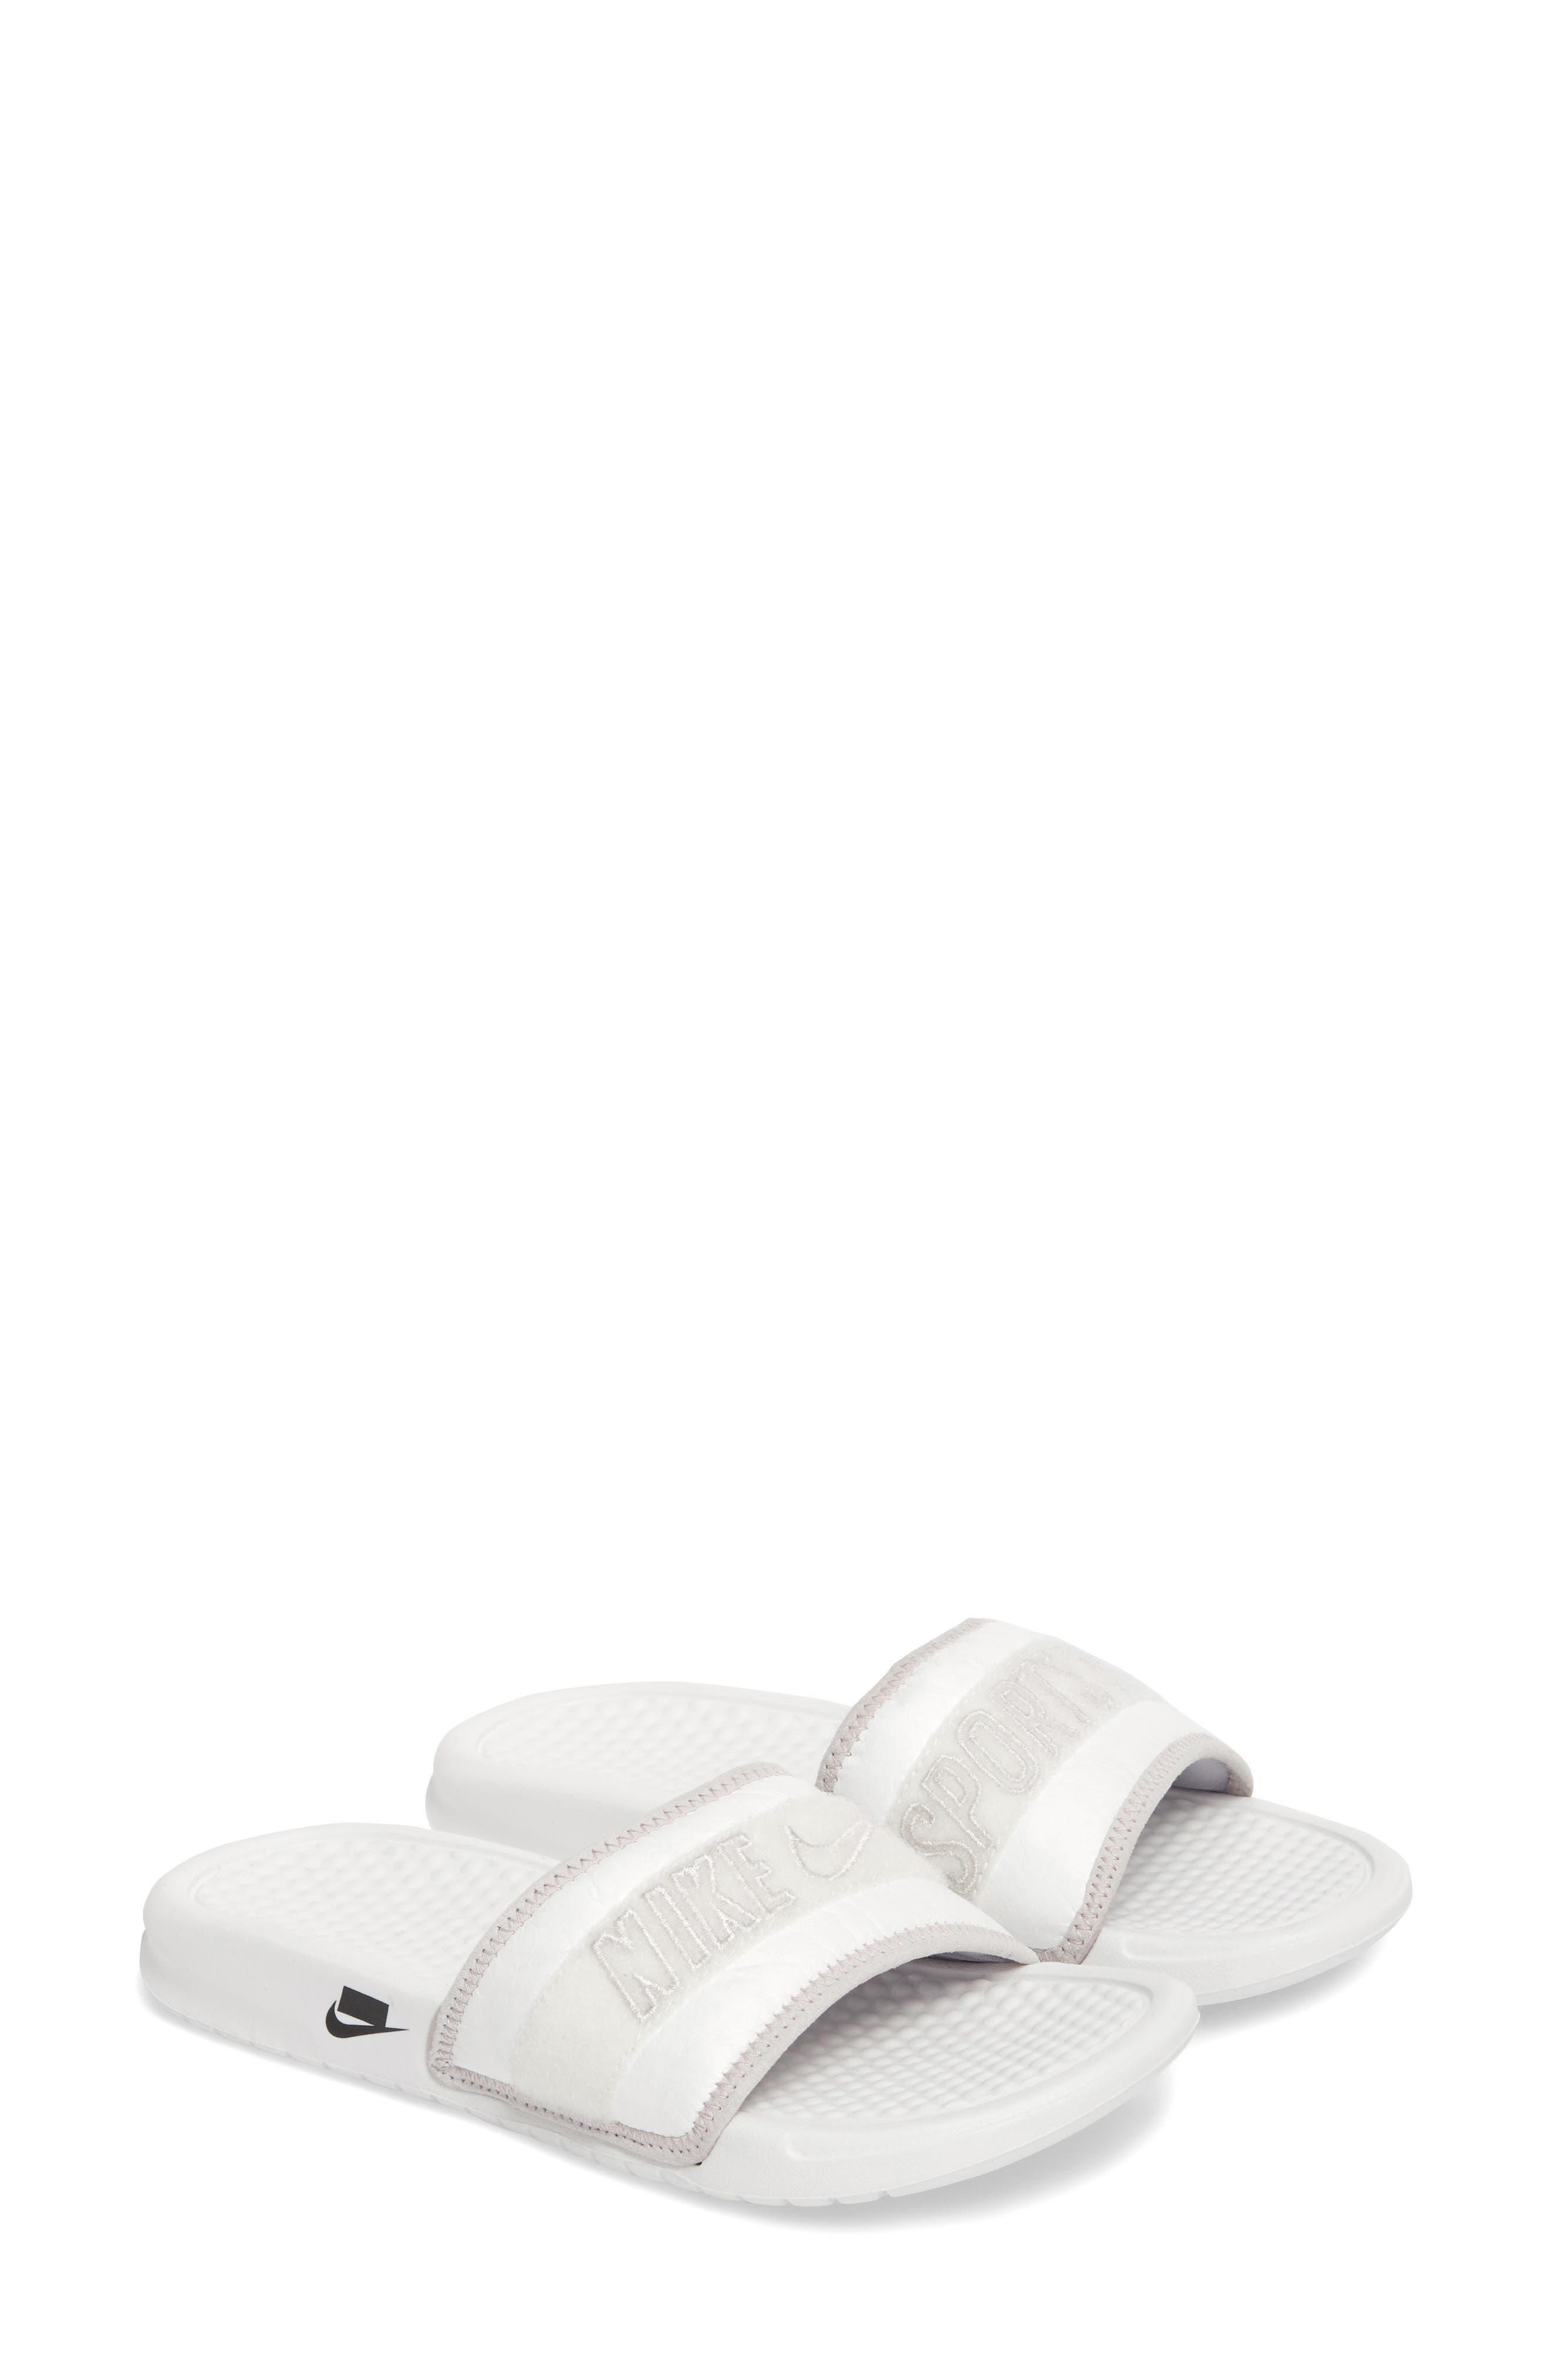 Nike Benassi JDI Tivek Sport Slide (Unisex)